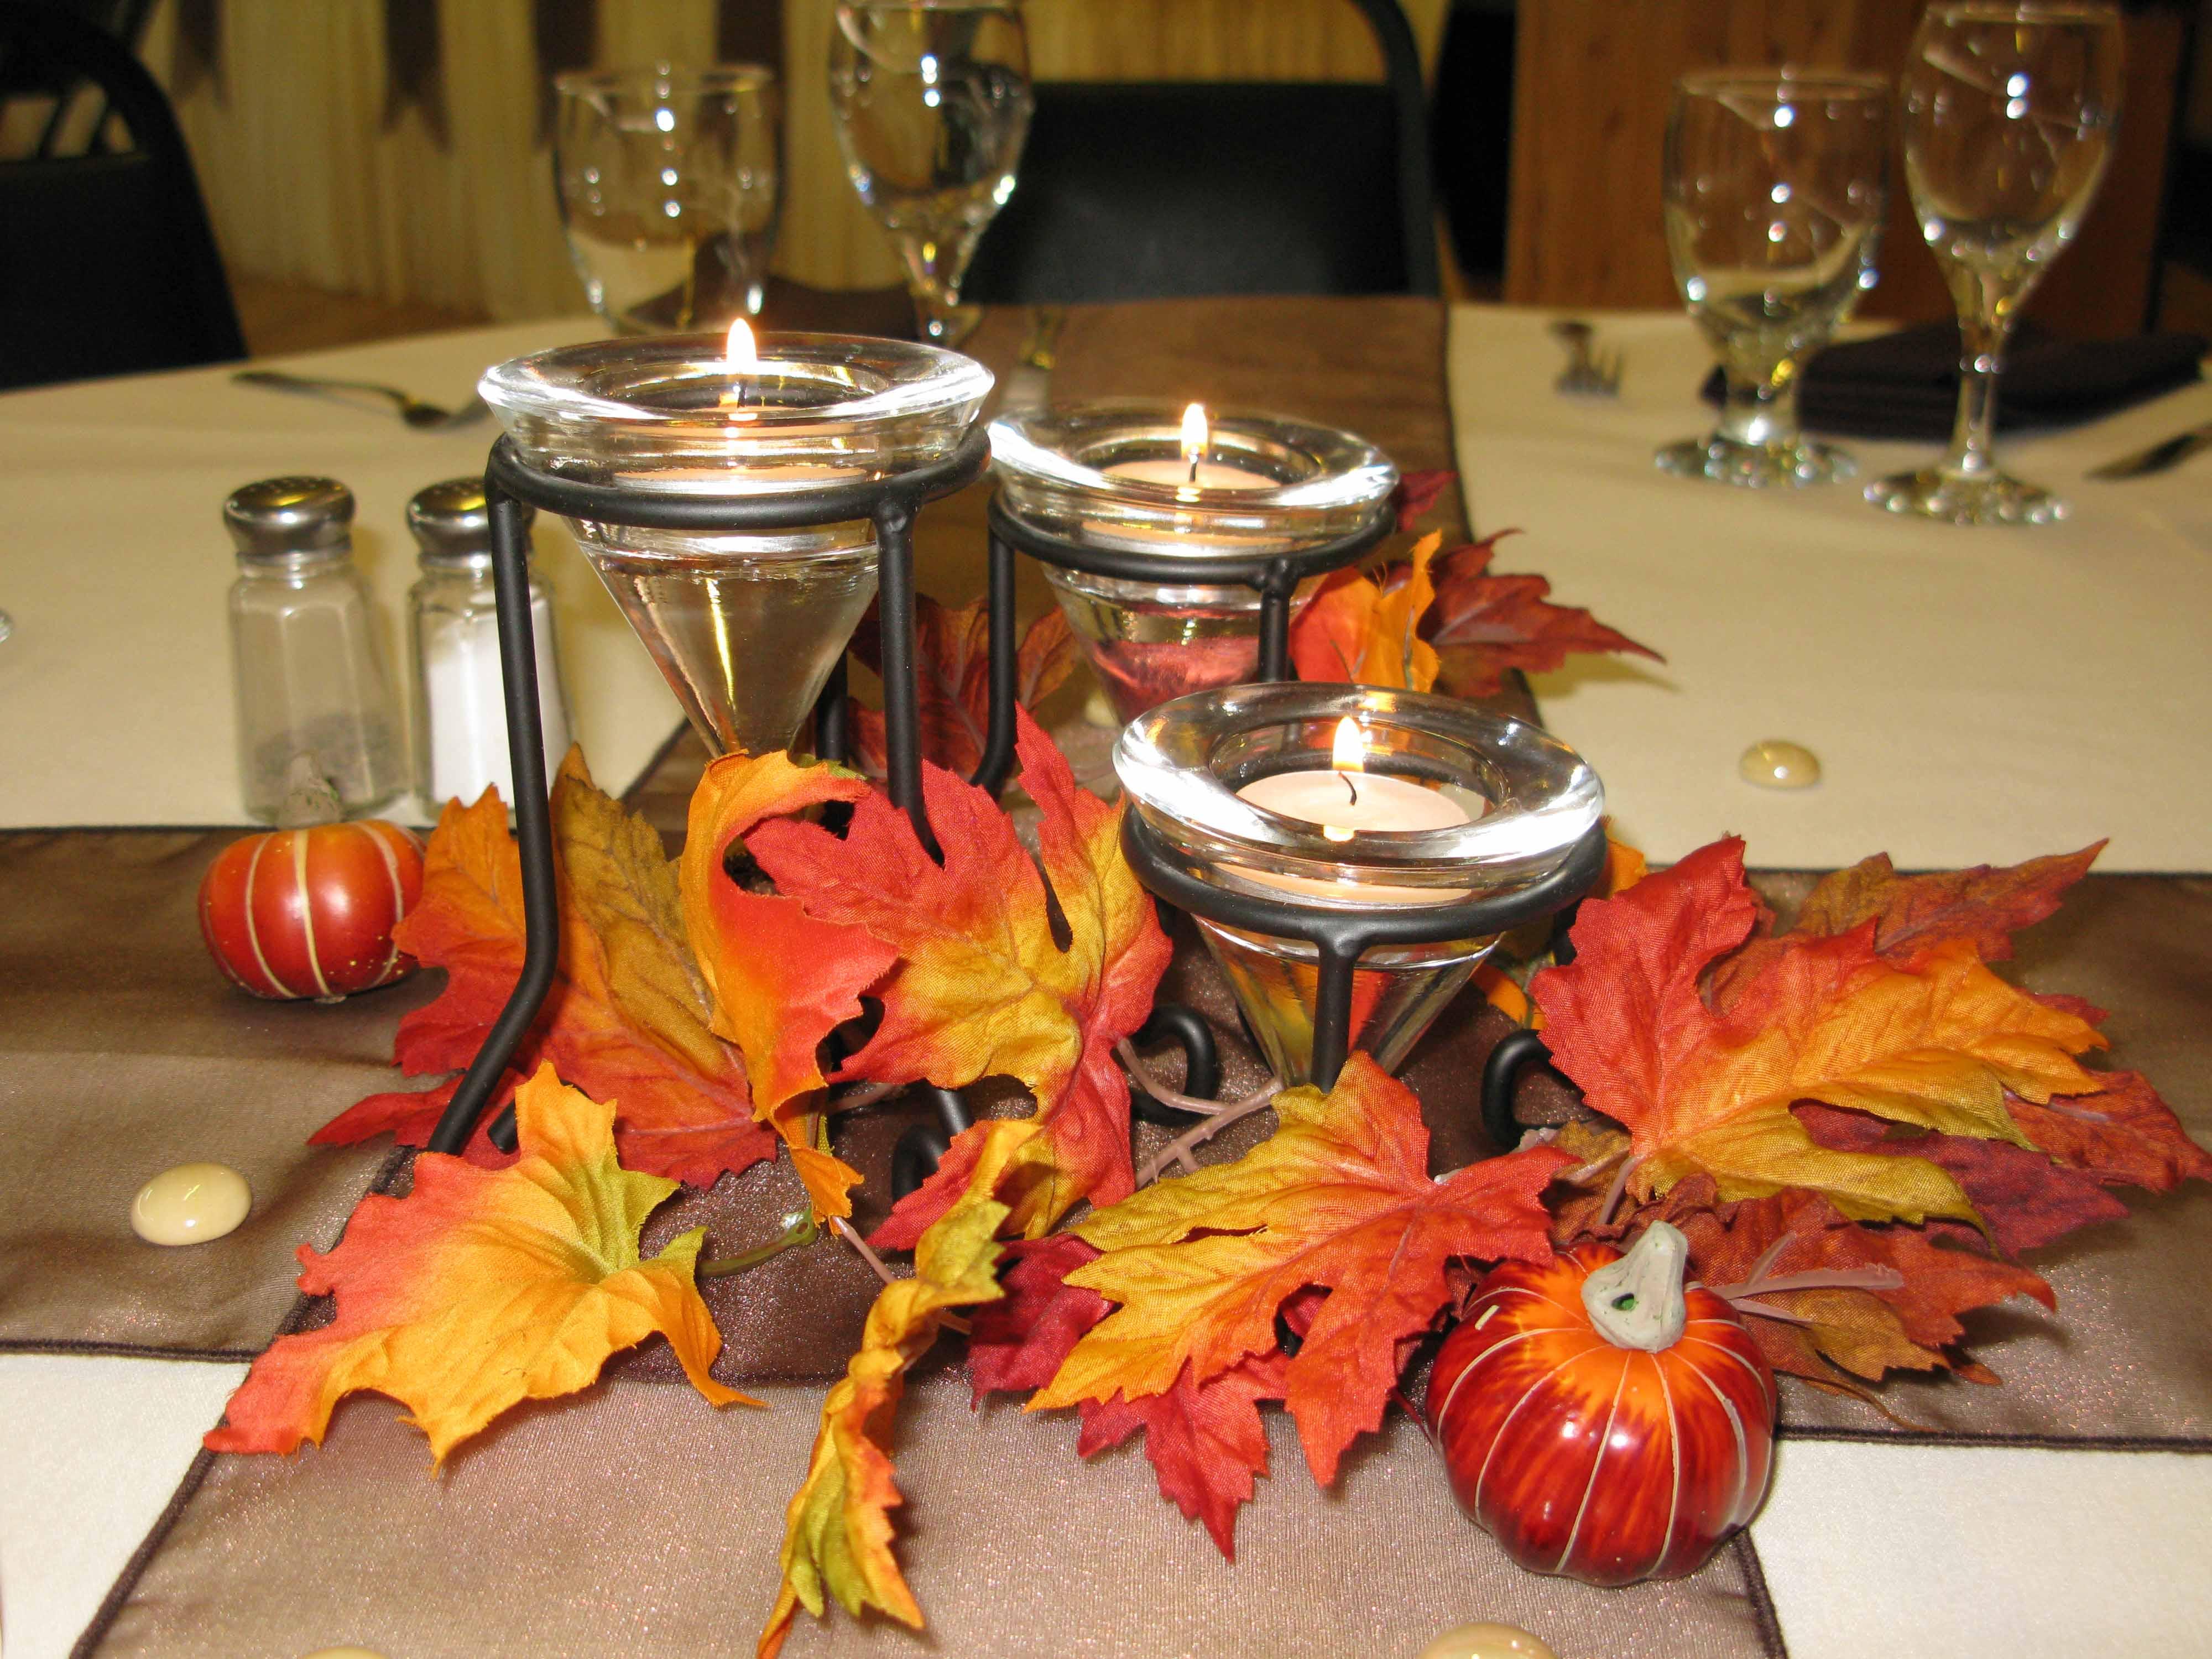 Fall Center Pieces Ideas - HomesFeed